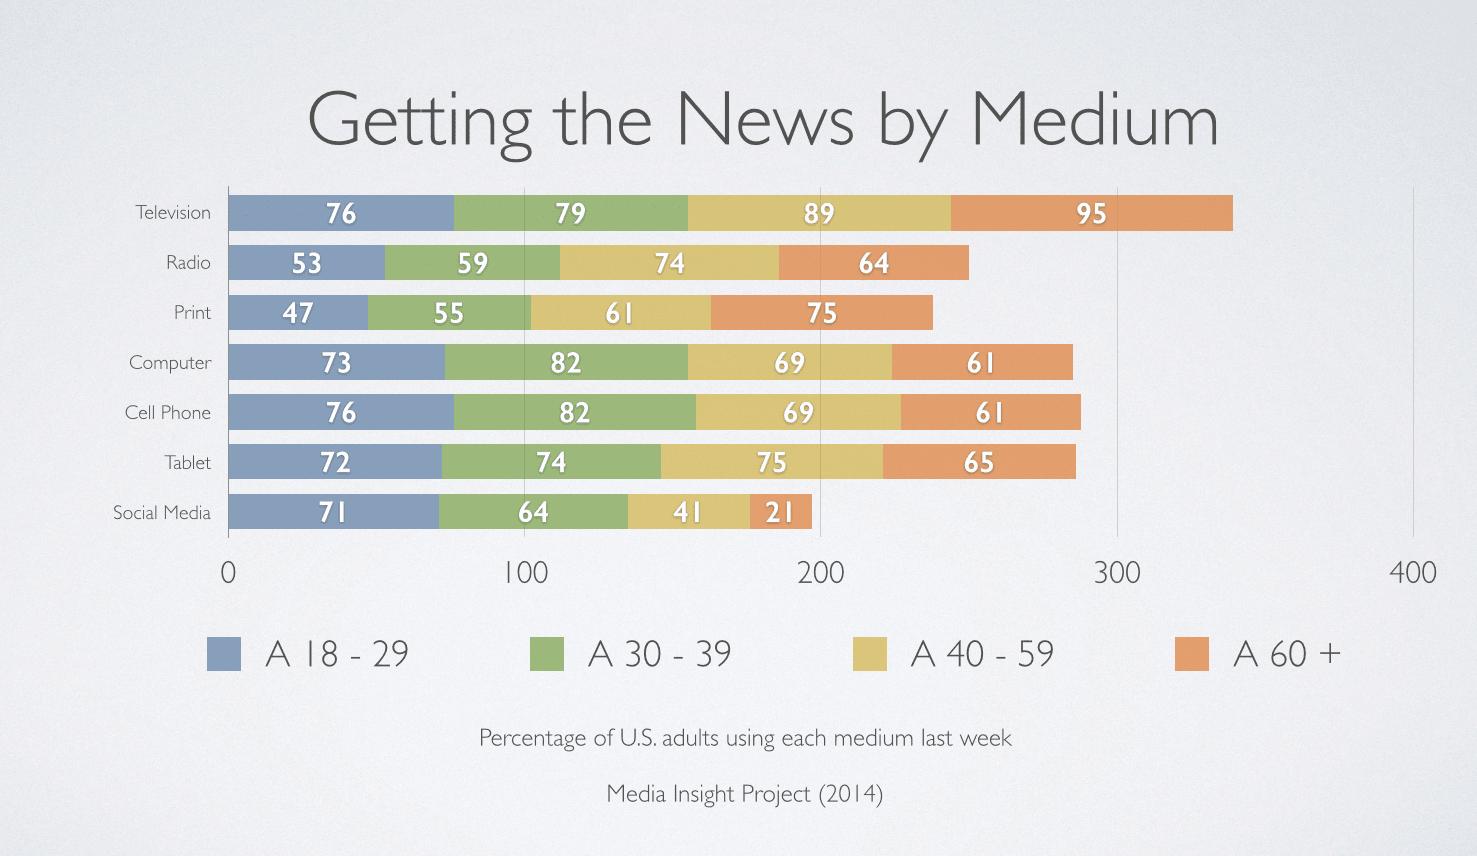 News Consumption by Medium